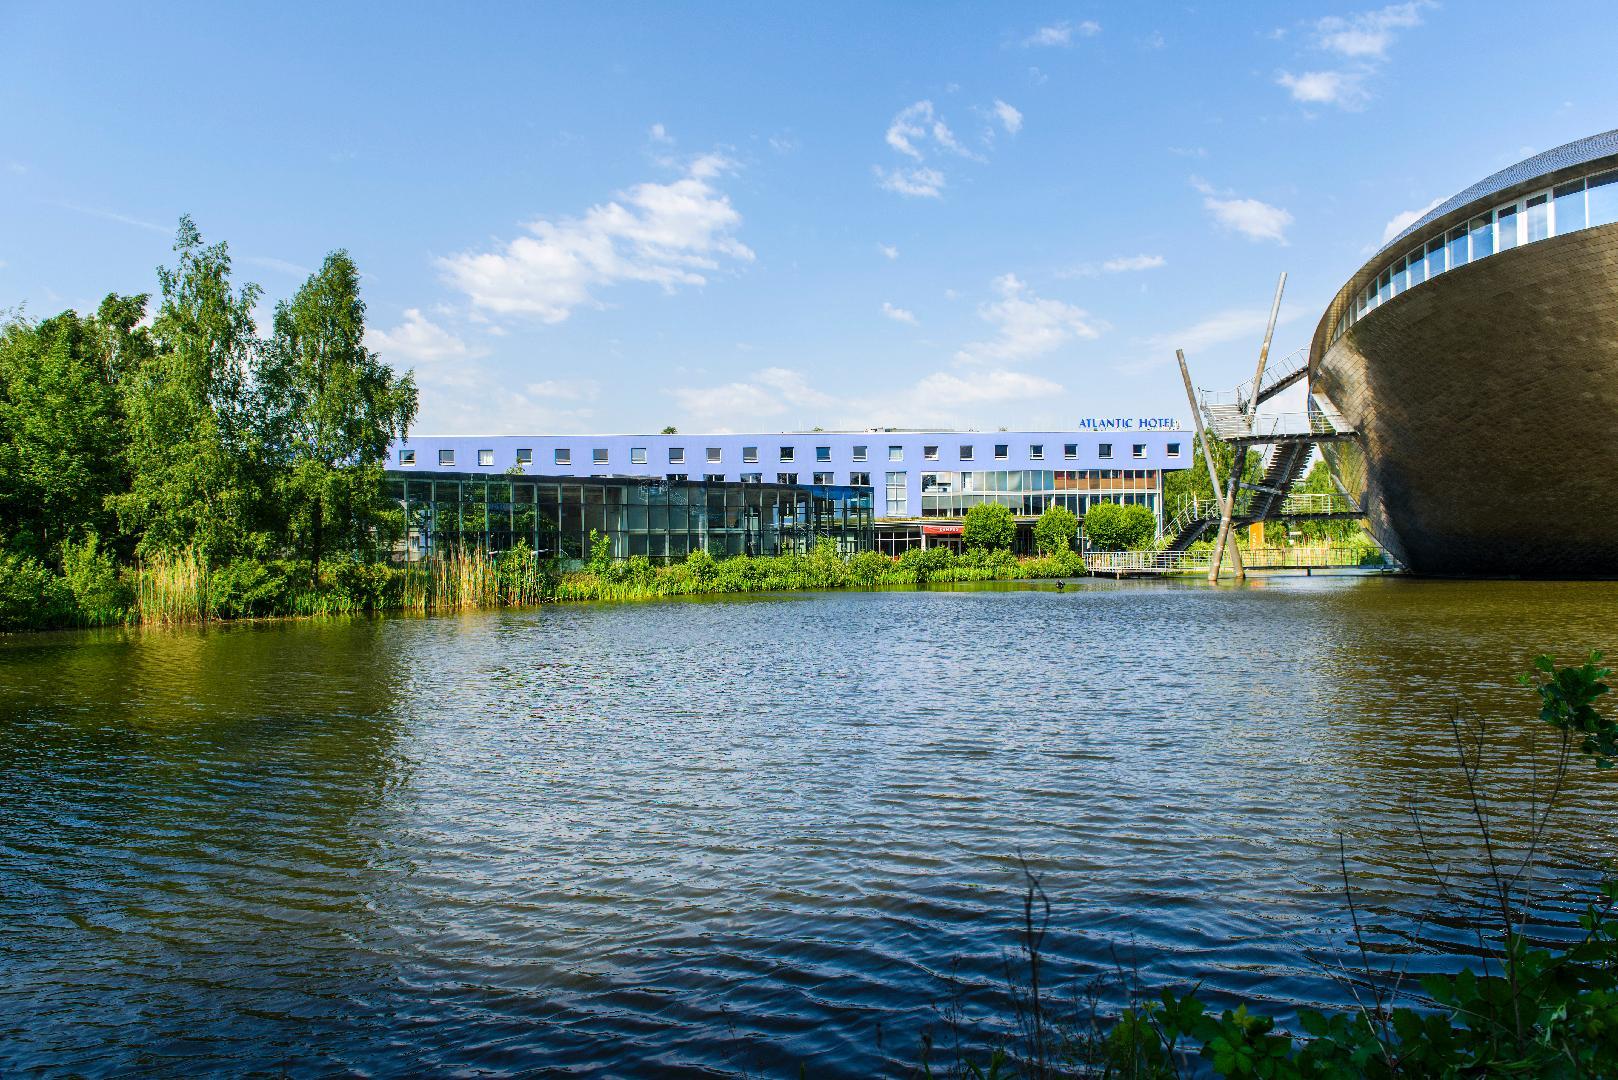 Atlantic Hotel Universum Hotel Bar Konferenzraum Restaurant Businesscenter Eventlocation Eventlocation In Bremen